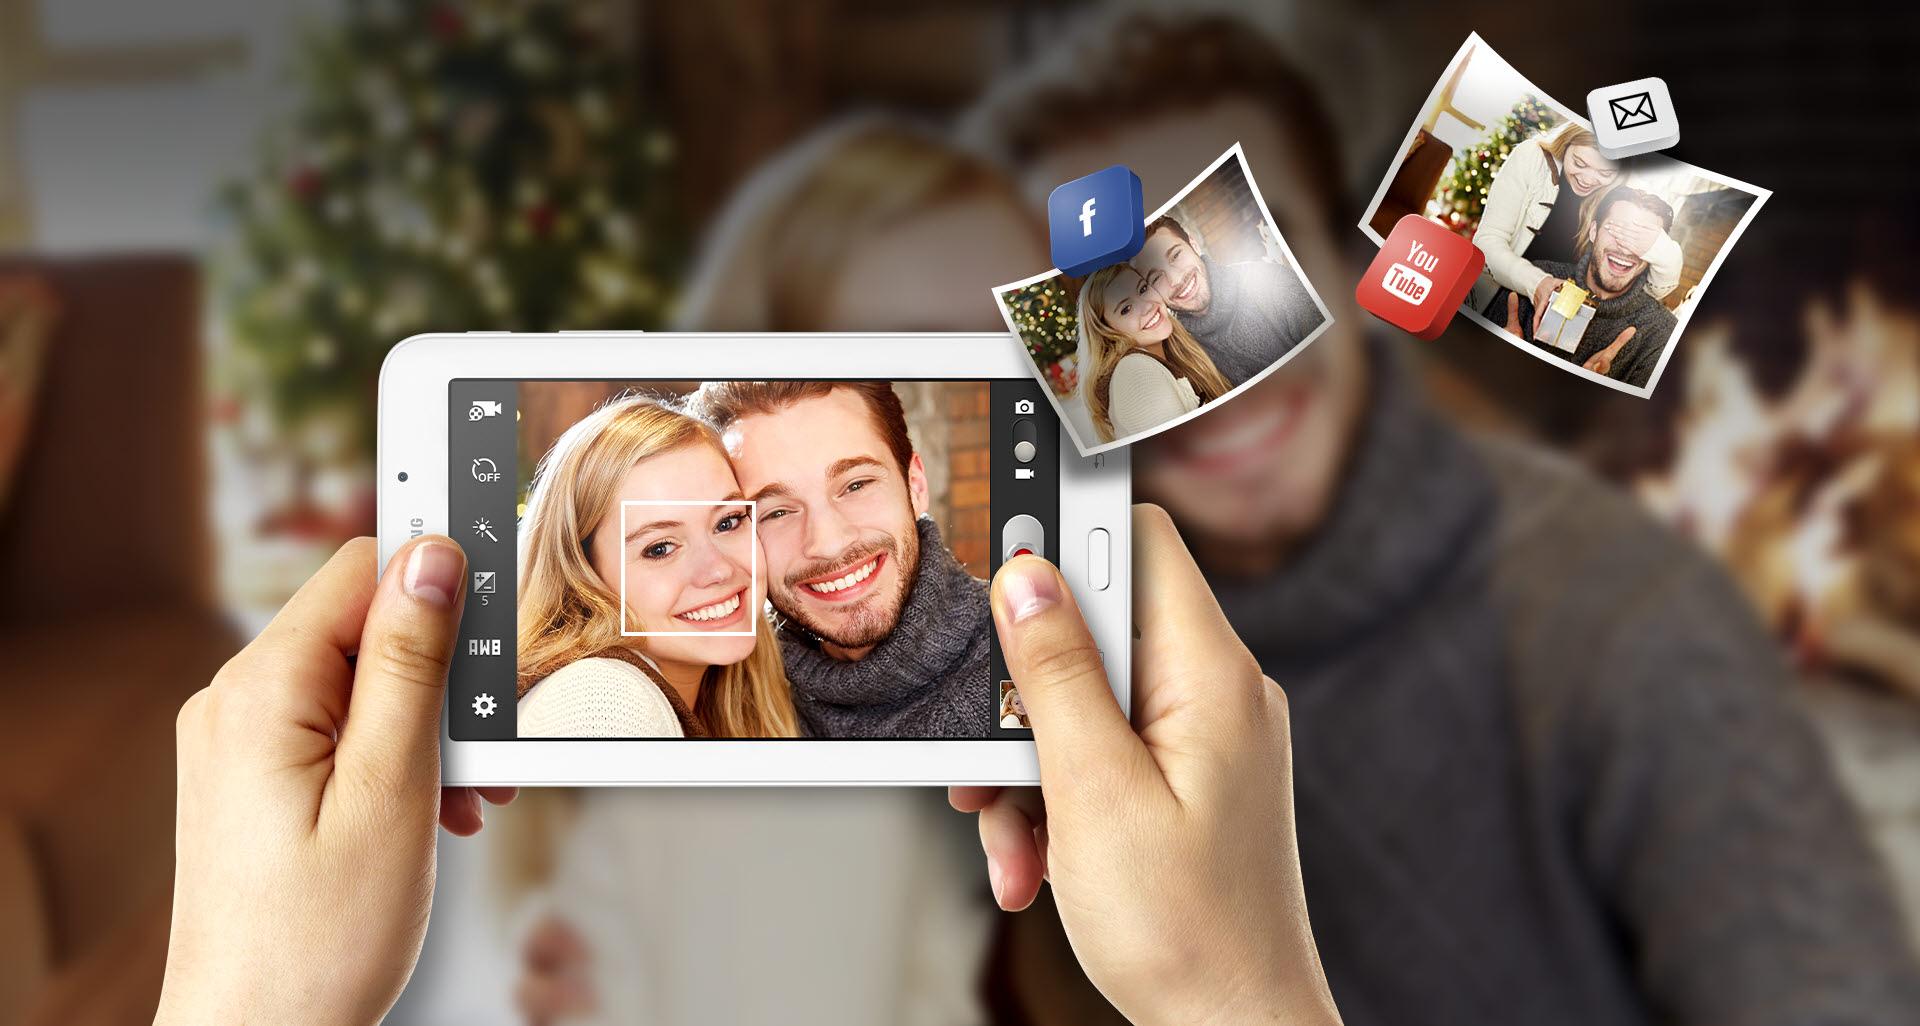 Samsung Galaxy Tab E 7.0 tablet